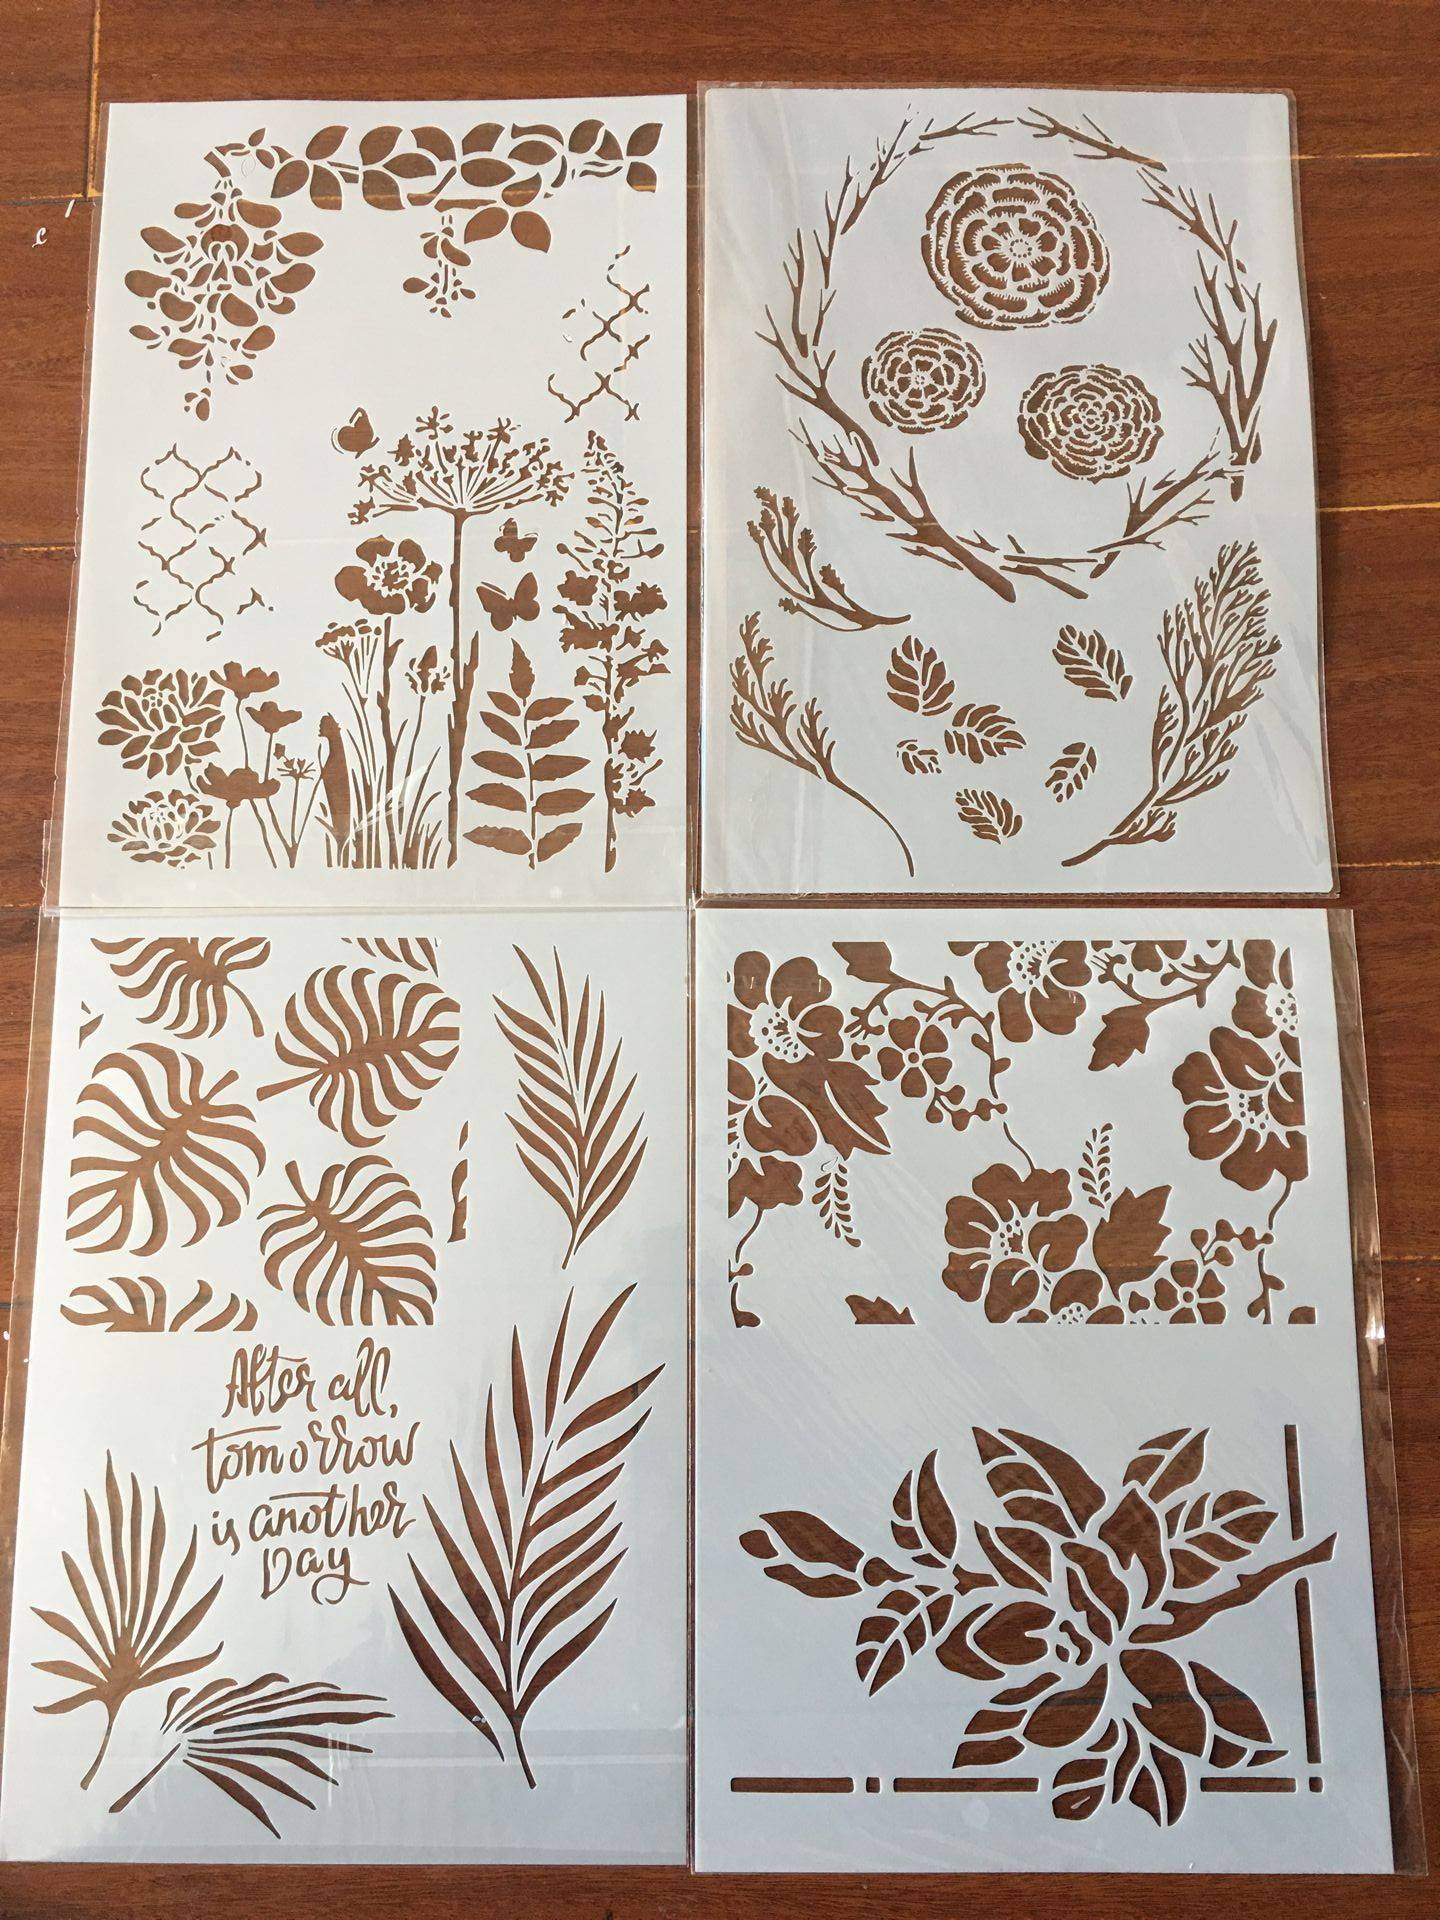 4pcs / Set A4 Flowers Leaves Seaweed Plant Stencils Painting Coloring Embossing Scrapbook Album Decorative Template